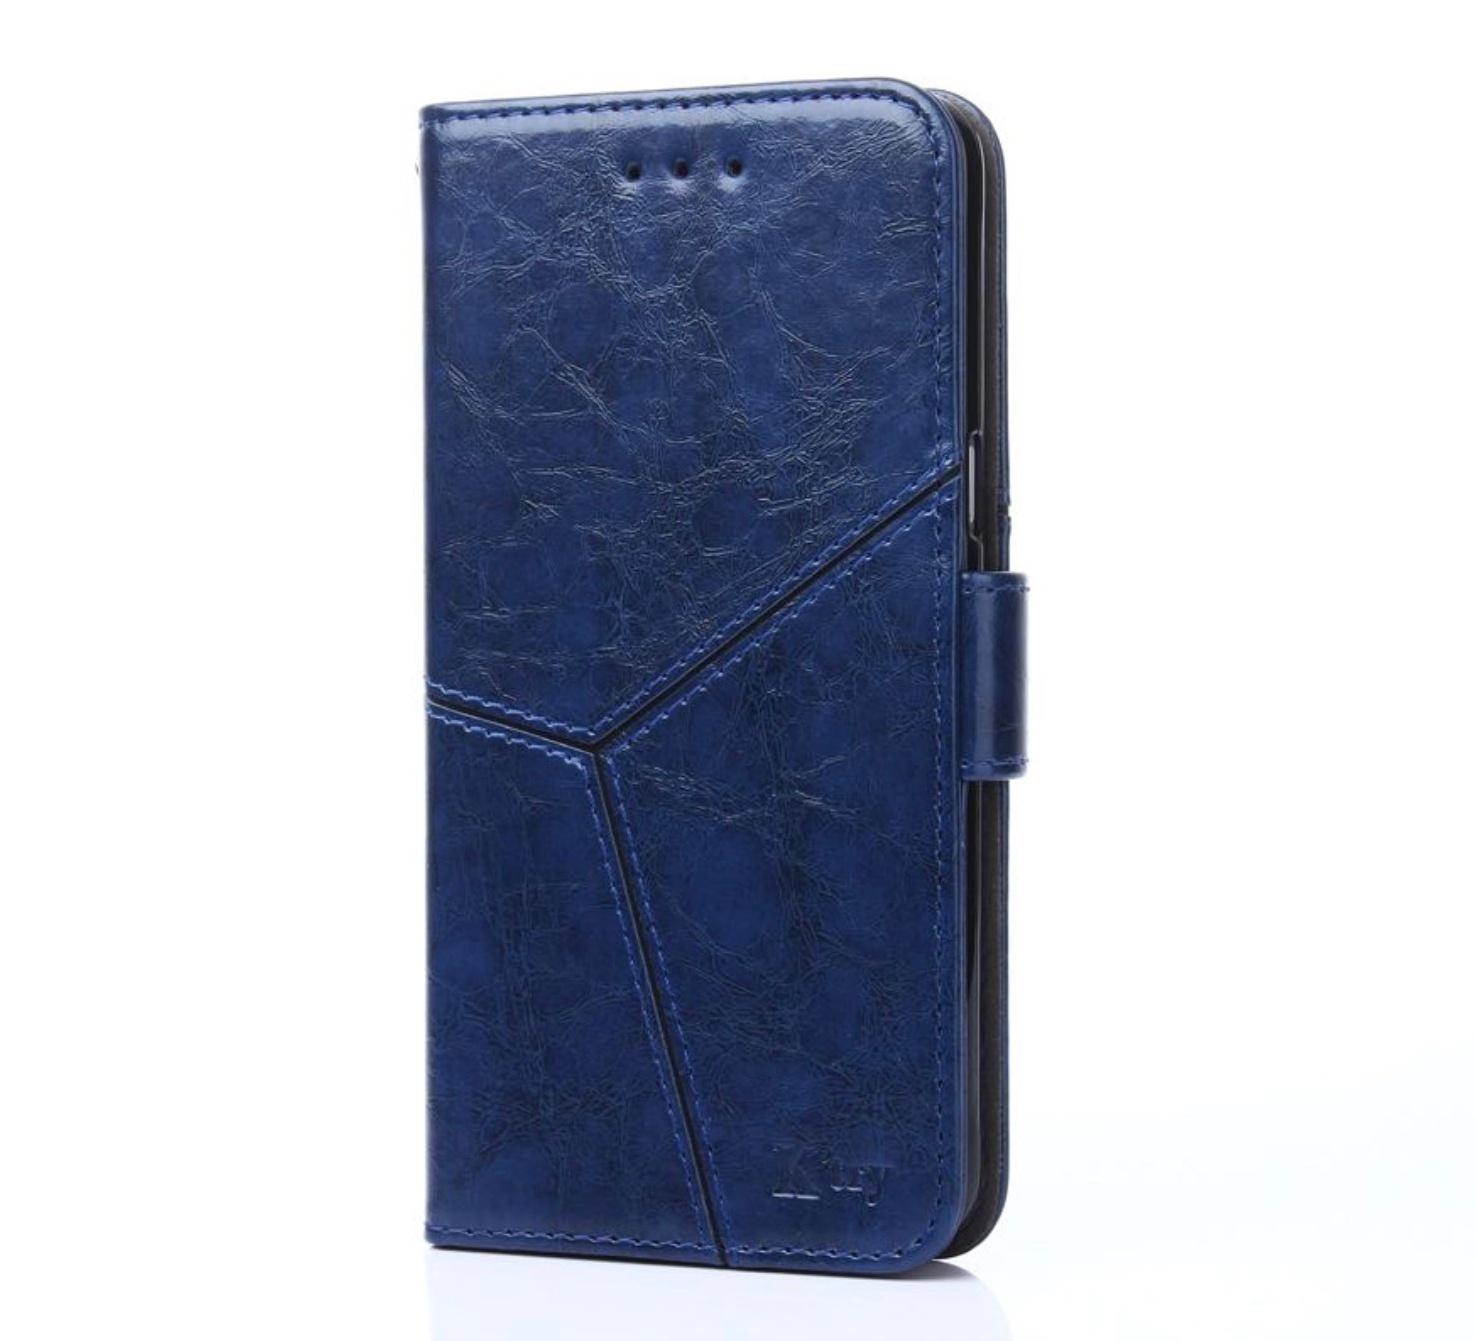 Чехол-книжка MyPads для Huawei Honor 8A/Huawei Y6 (2019)/ Honor 8A Pro/ Y6 Prime 2019 прошитый по контуру с необычным геометрическим швом синий